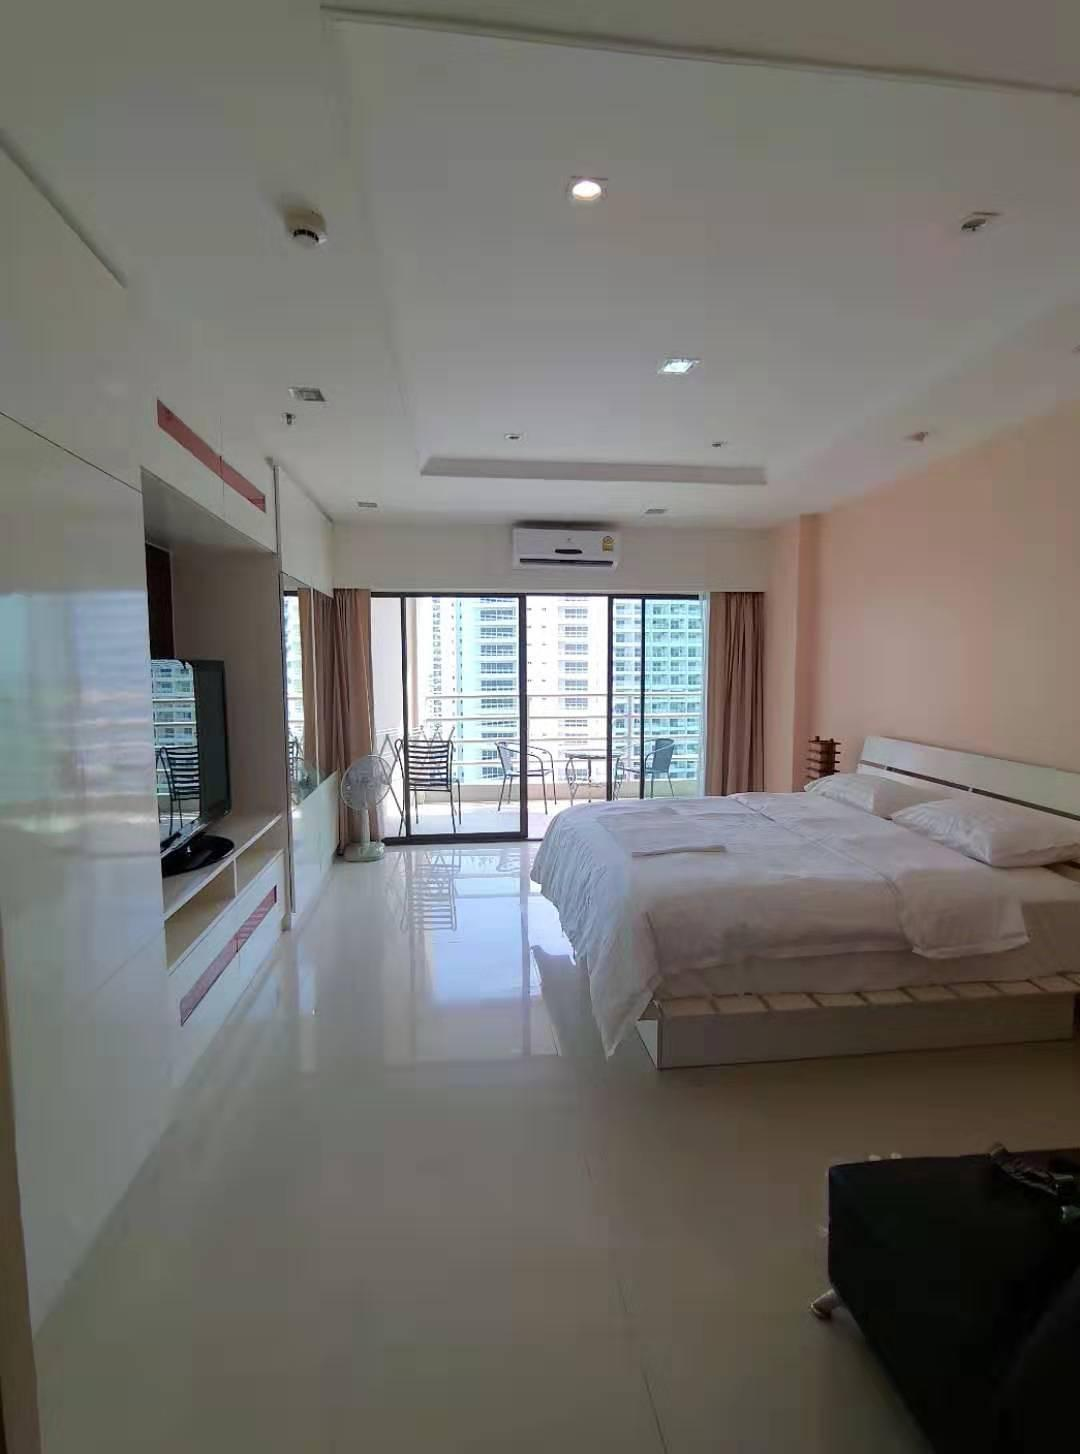 Pattaya View Talay  High end beach apartment 18 อพาร์ตเมนต์ 1 ห้องนอน 1 ห้องน้ำส่วนตัว ขนาด 48 ตร.ม. – พัทยากลาง